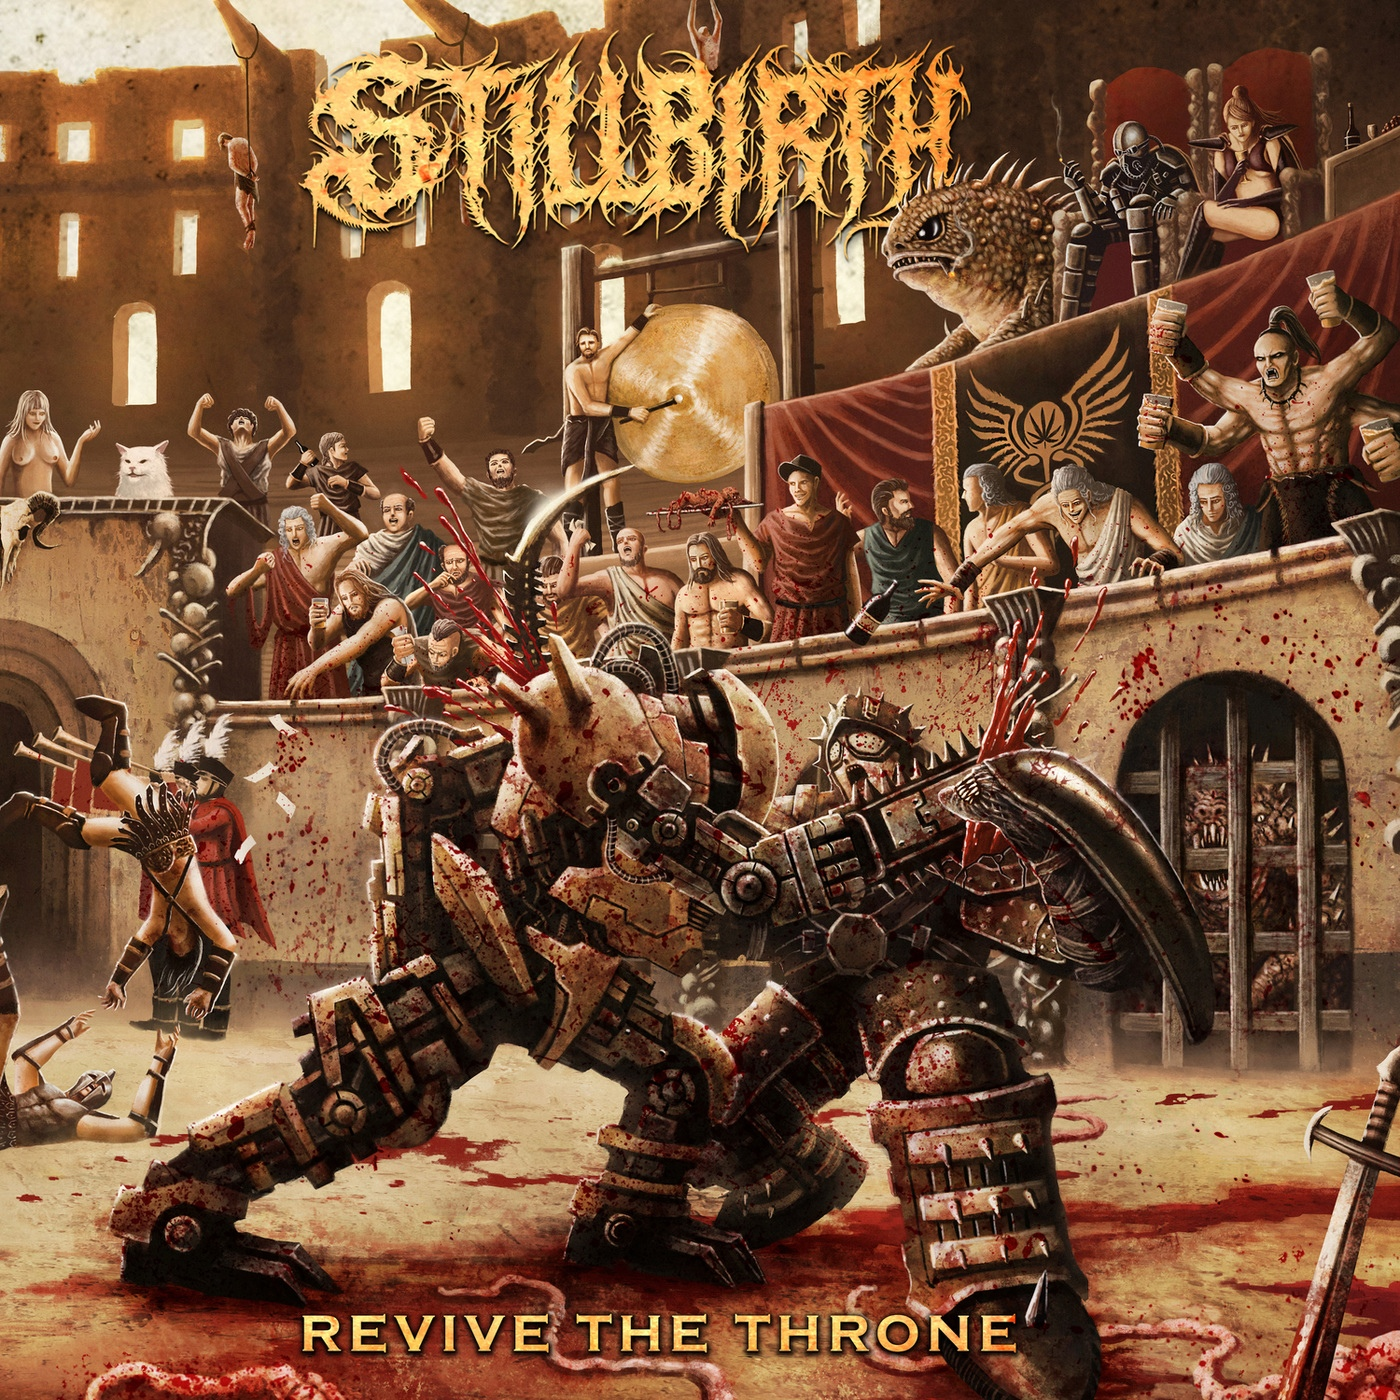 Stillbirth - Revive the Throne [single] (2020)